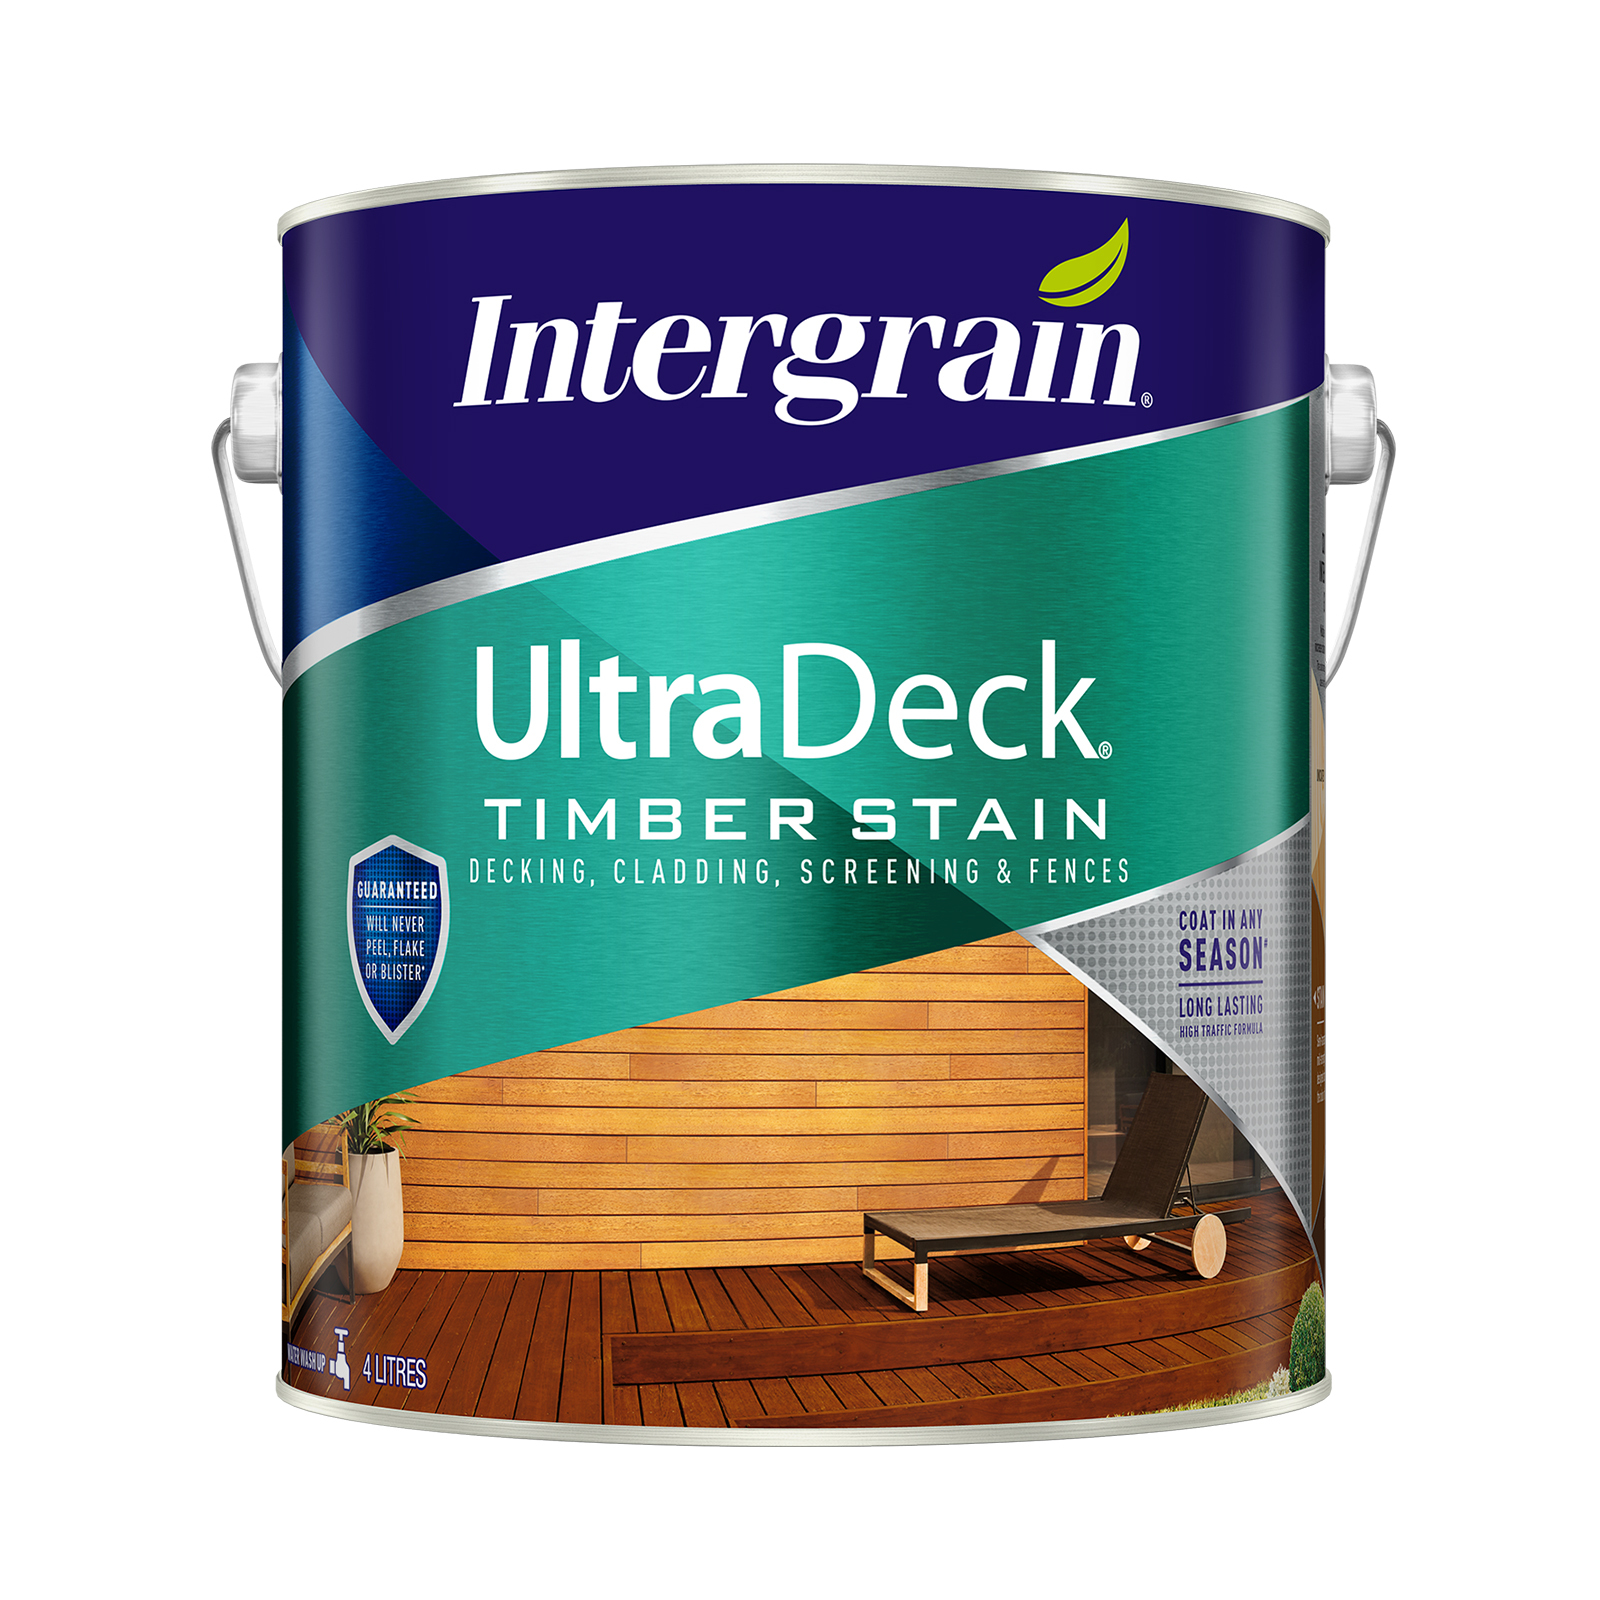 Intergrain 4L Merbau UltraDeck Timber Decking Stain